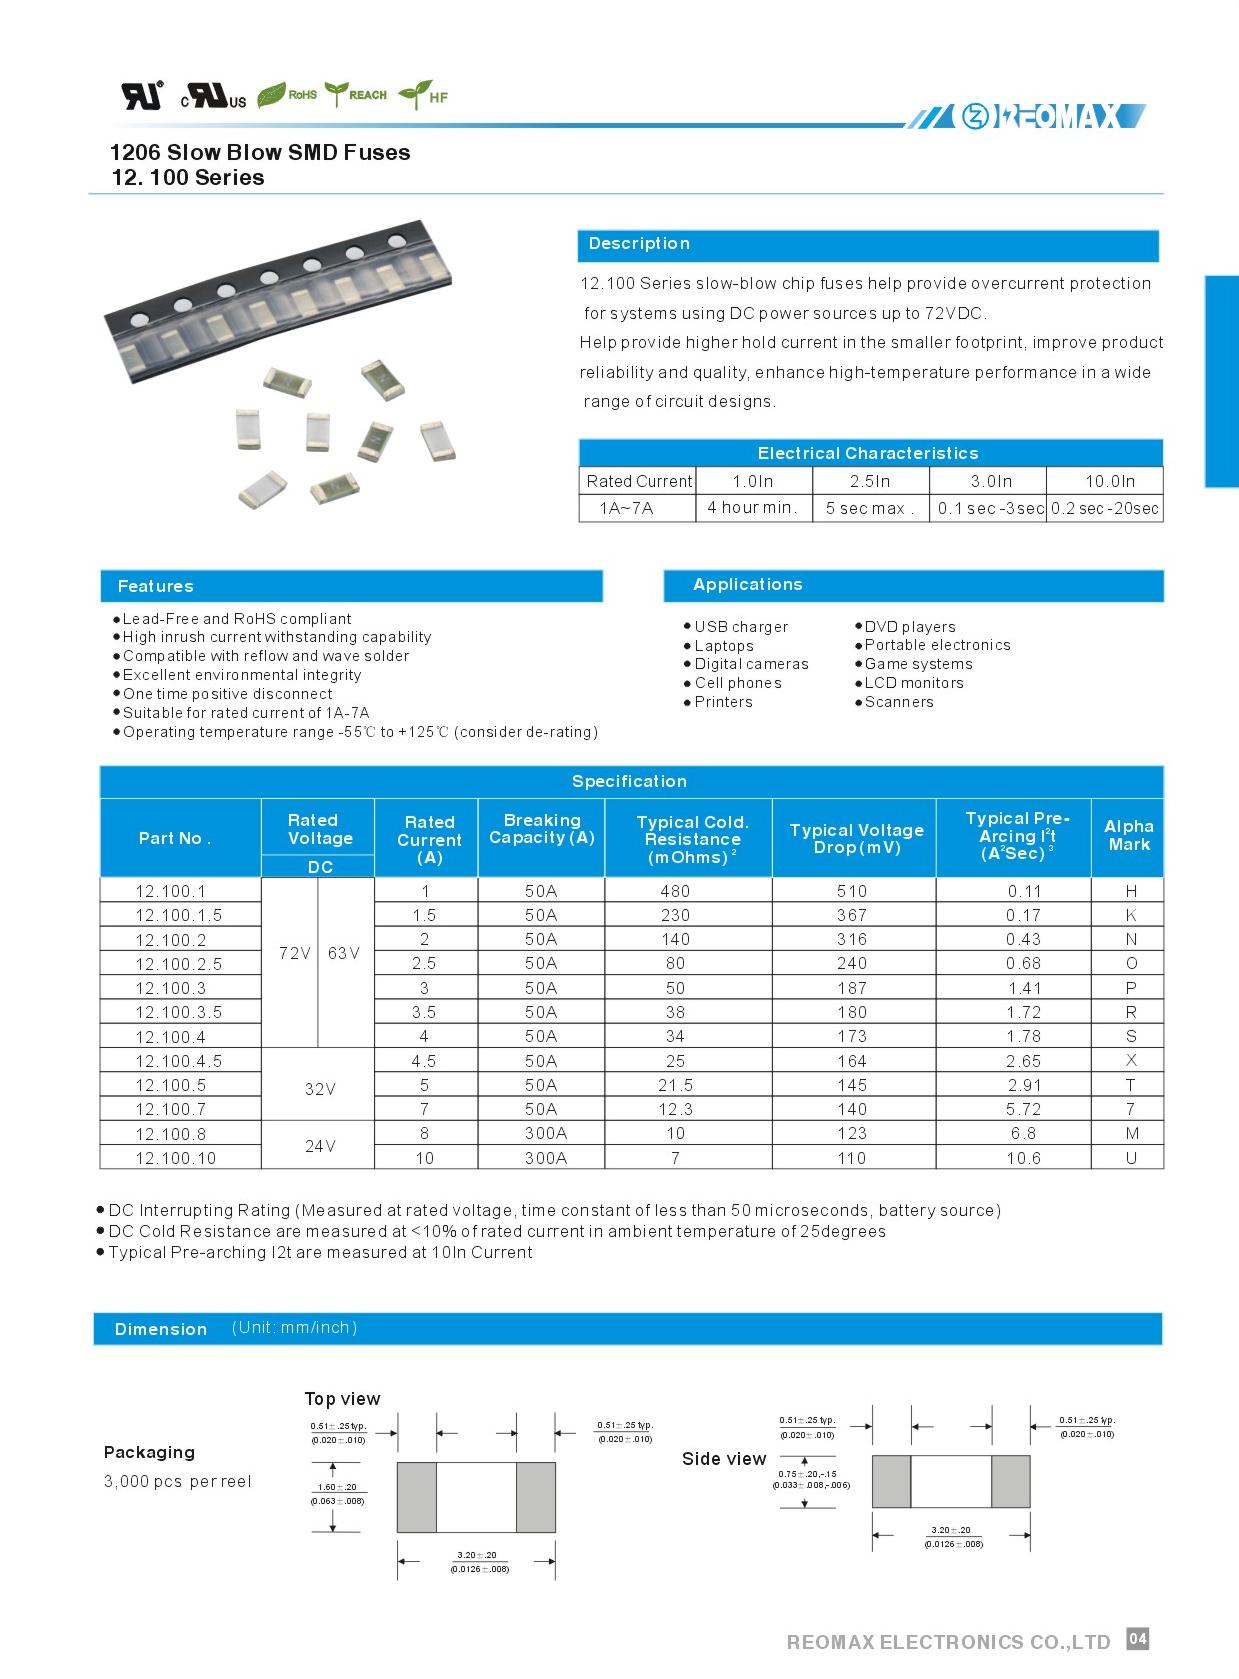 Reomax Electronics (HK) Limited